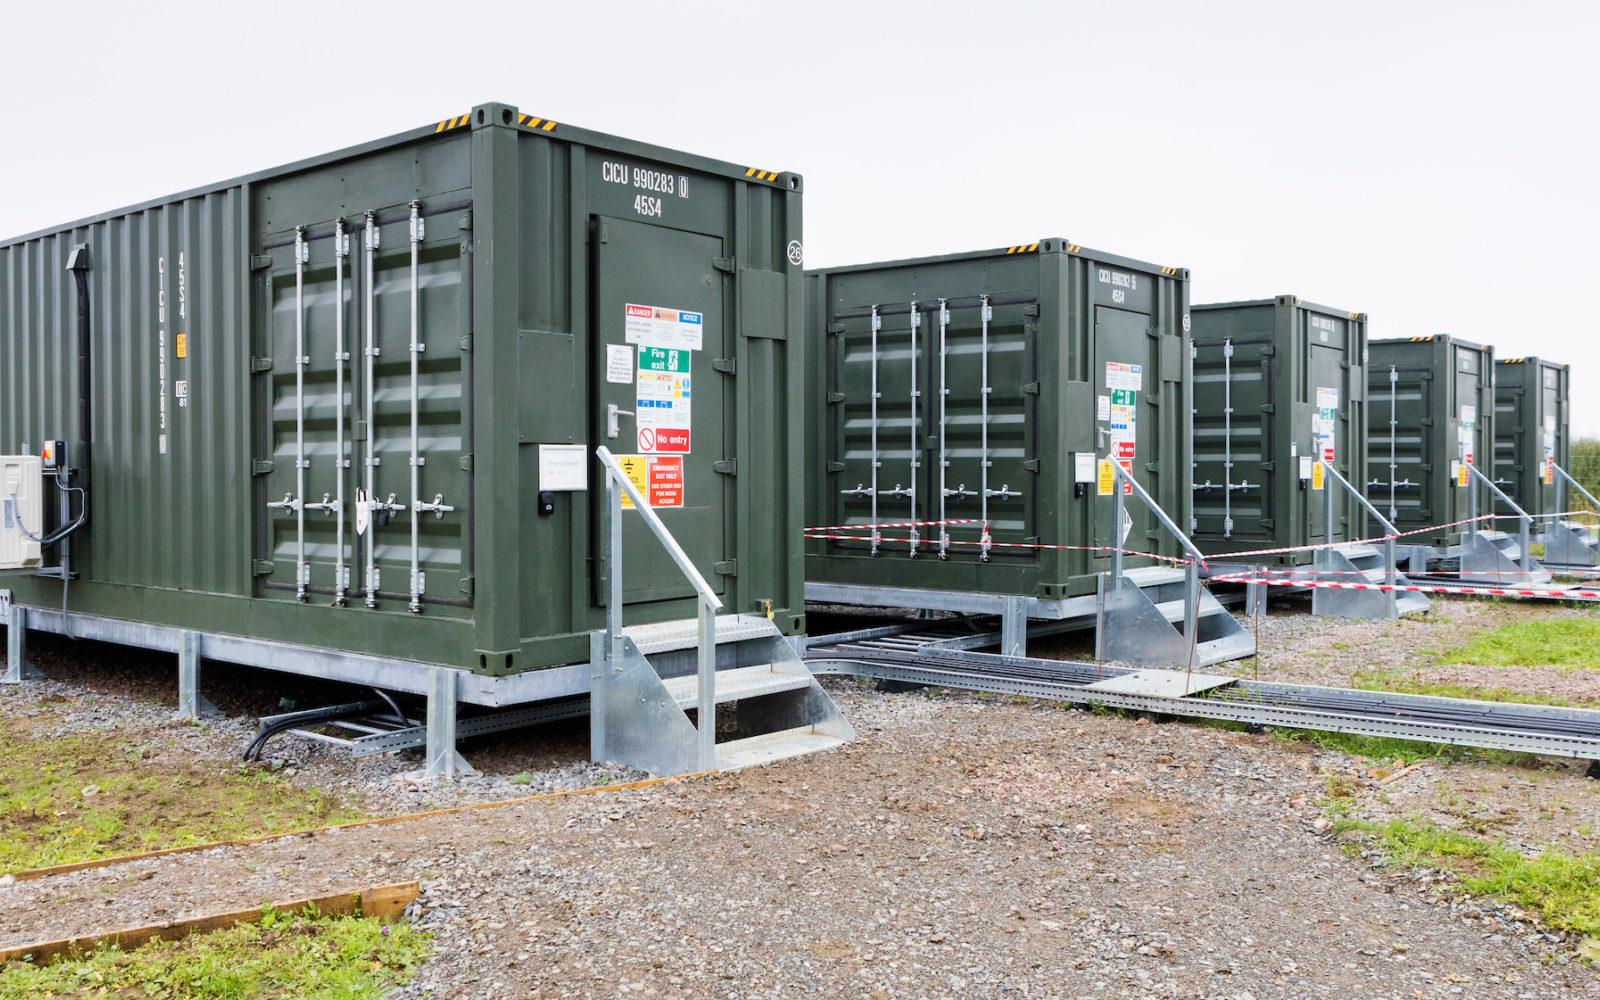 Ireland Storage Pipeline Near 2 5gw New Report Available From Solar Media Solar Power Portal